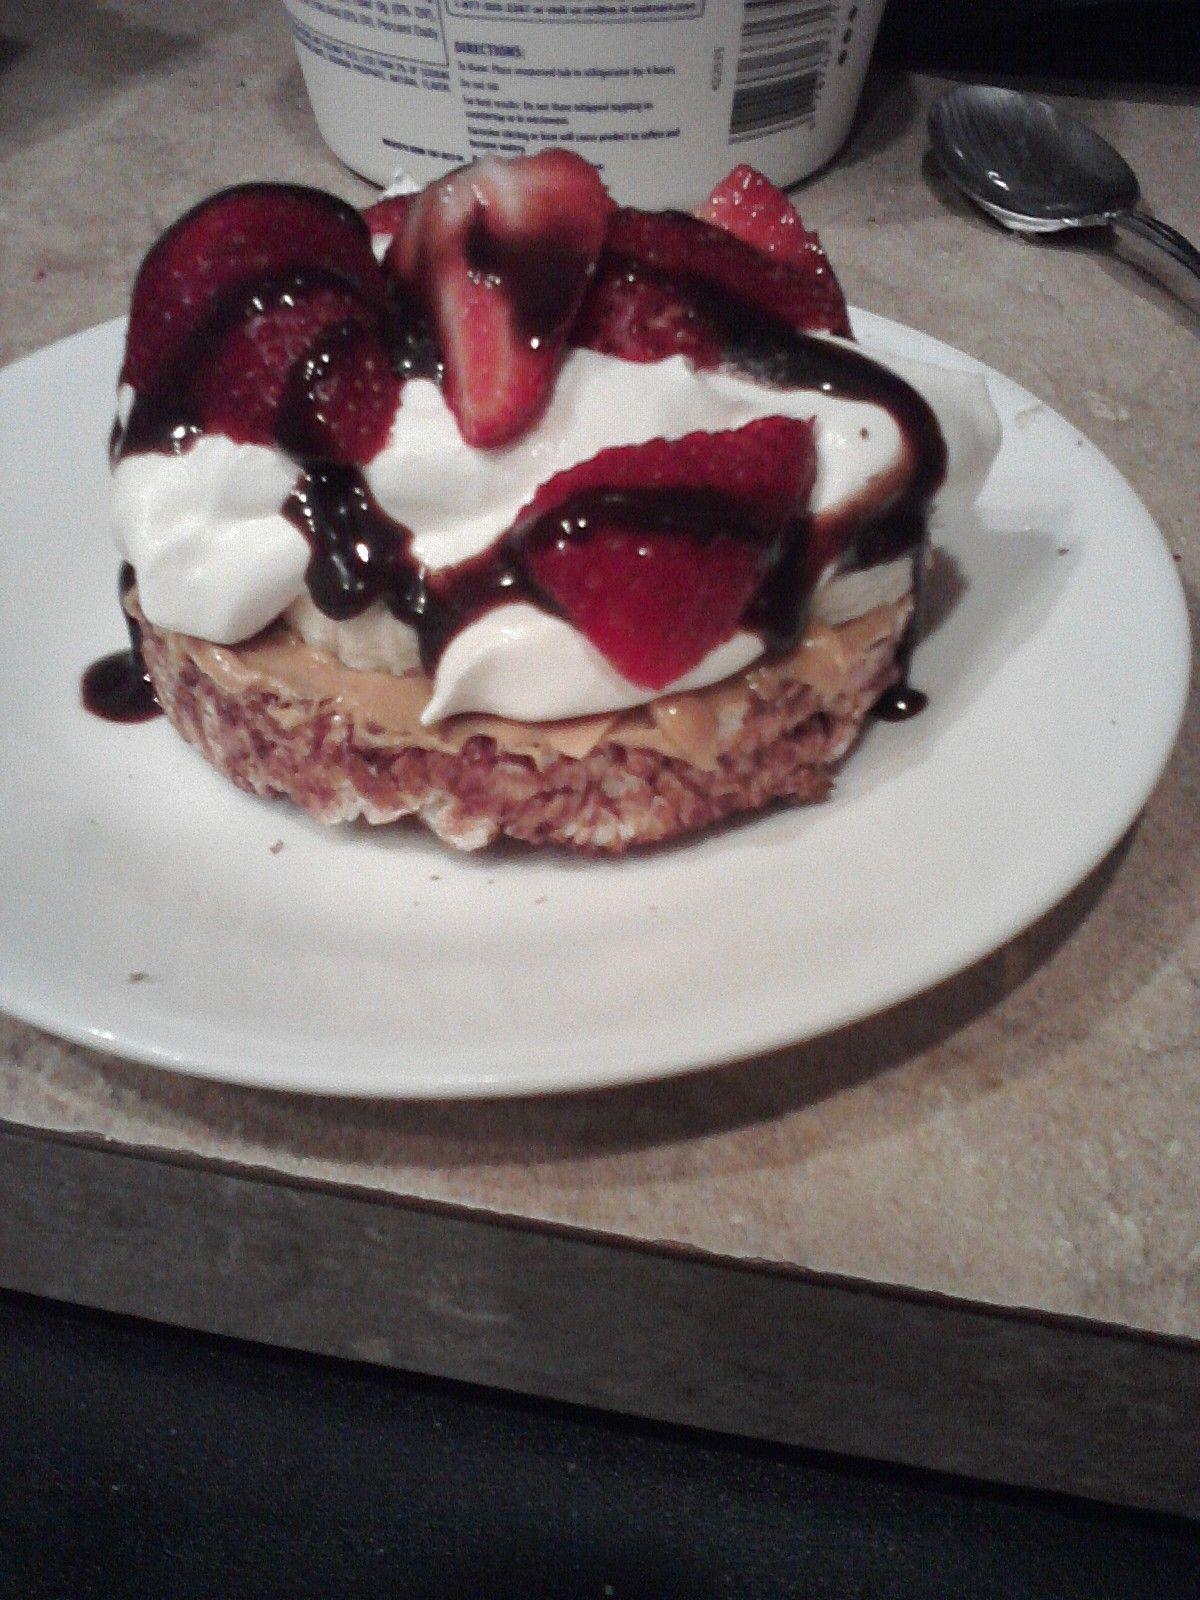 Pin on delightful desserts